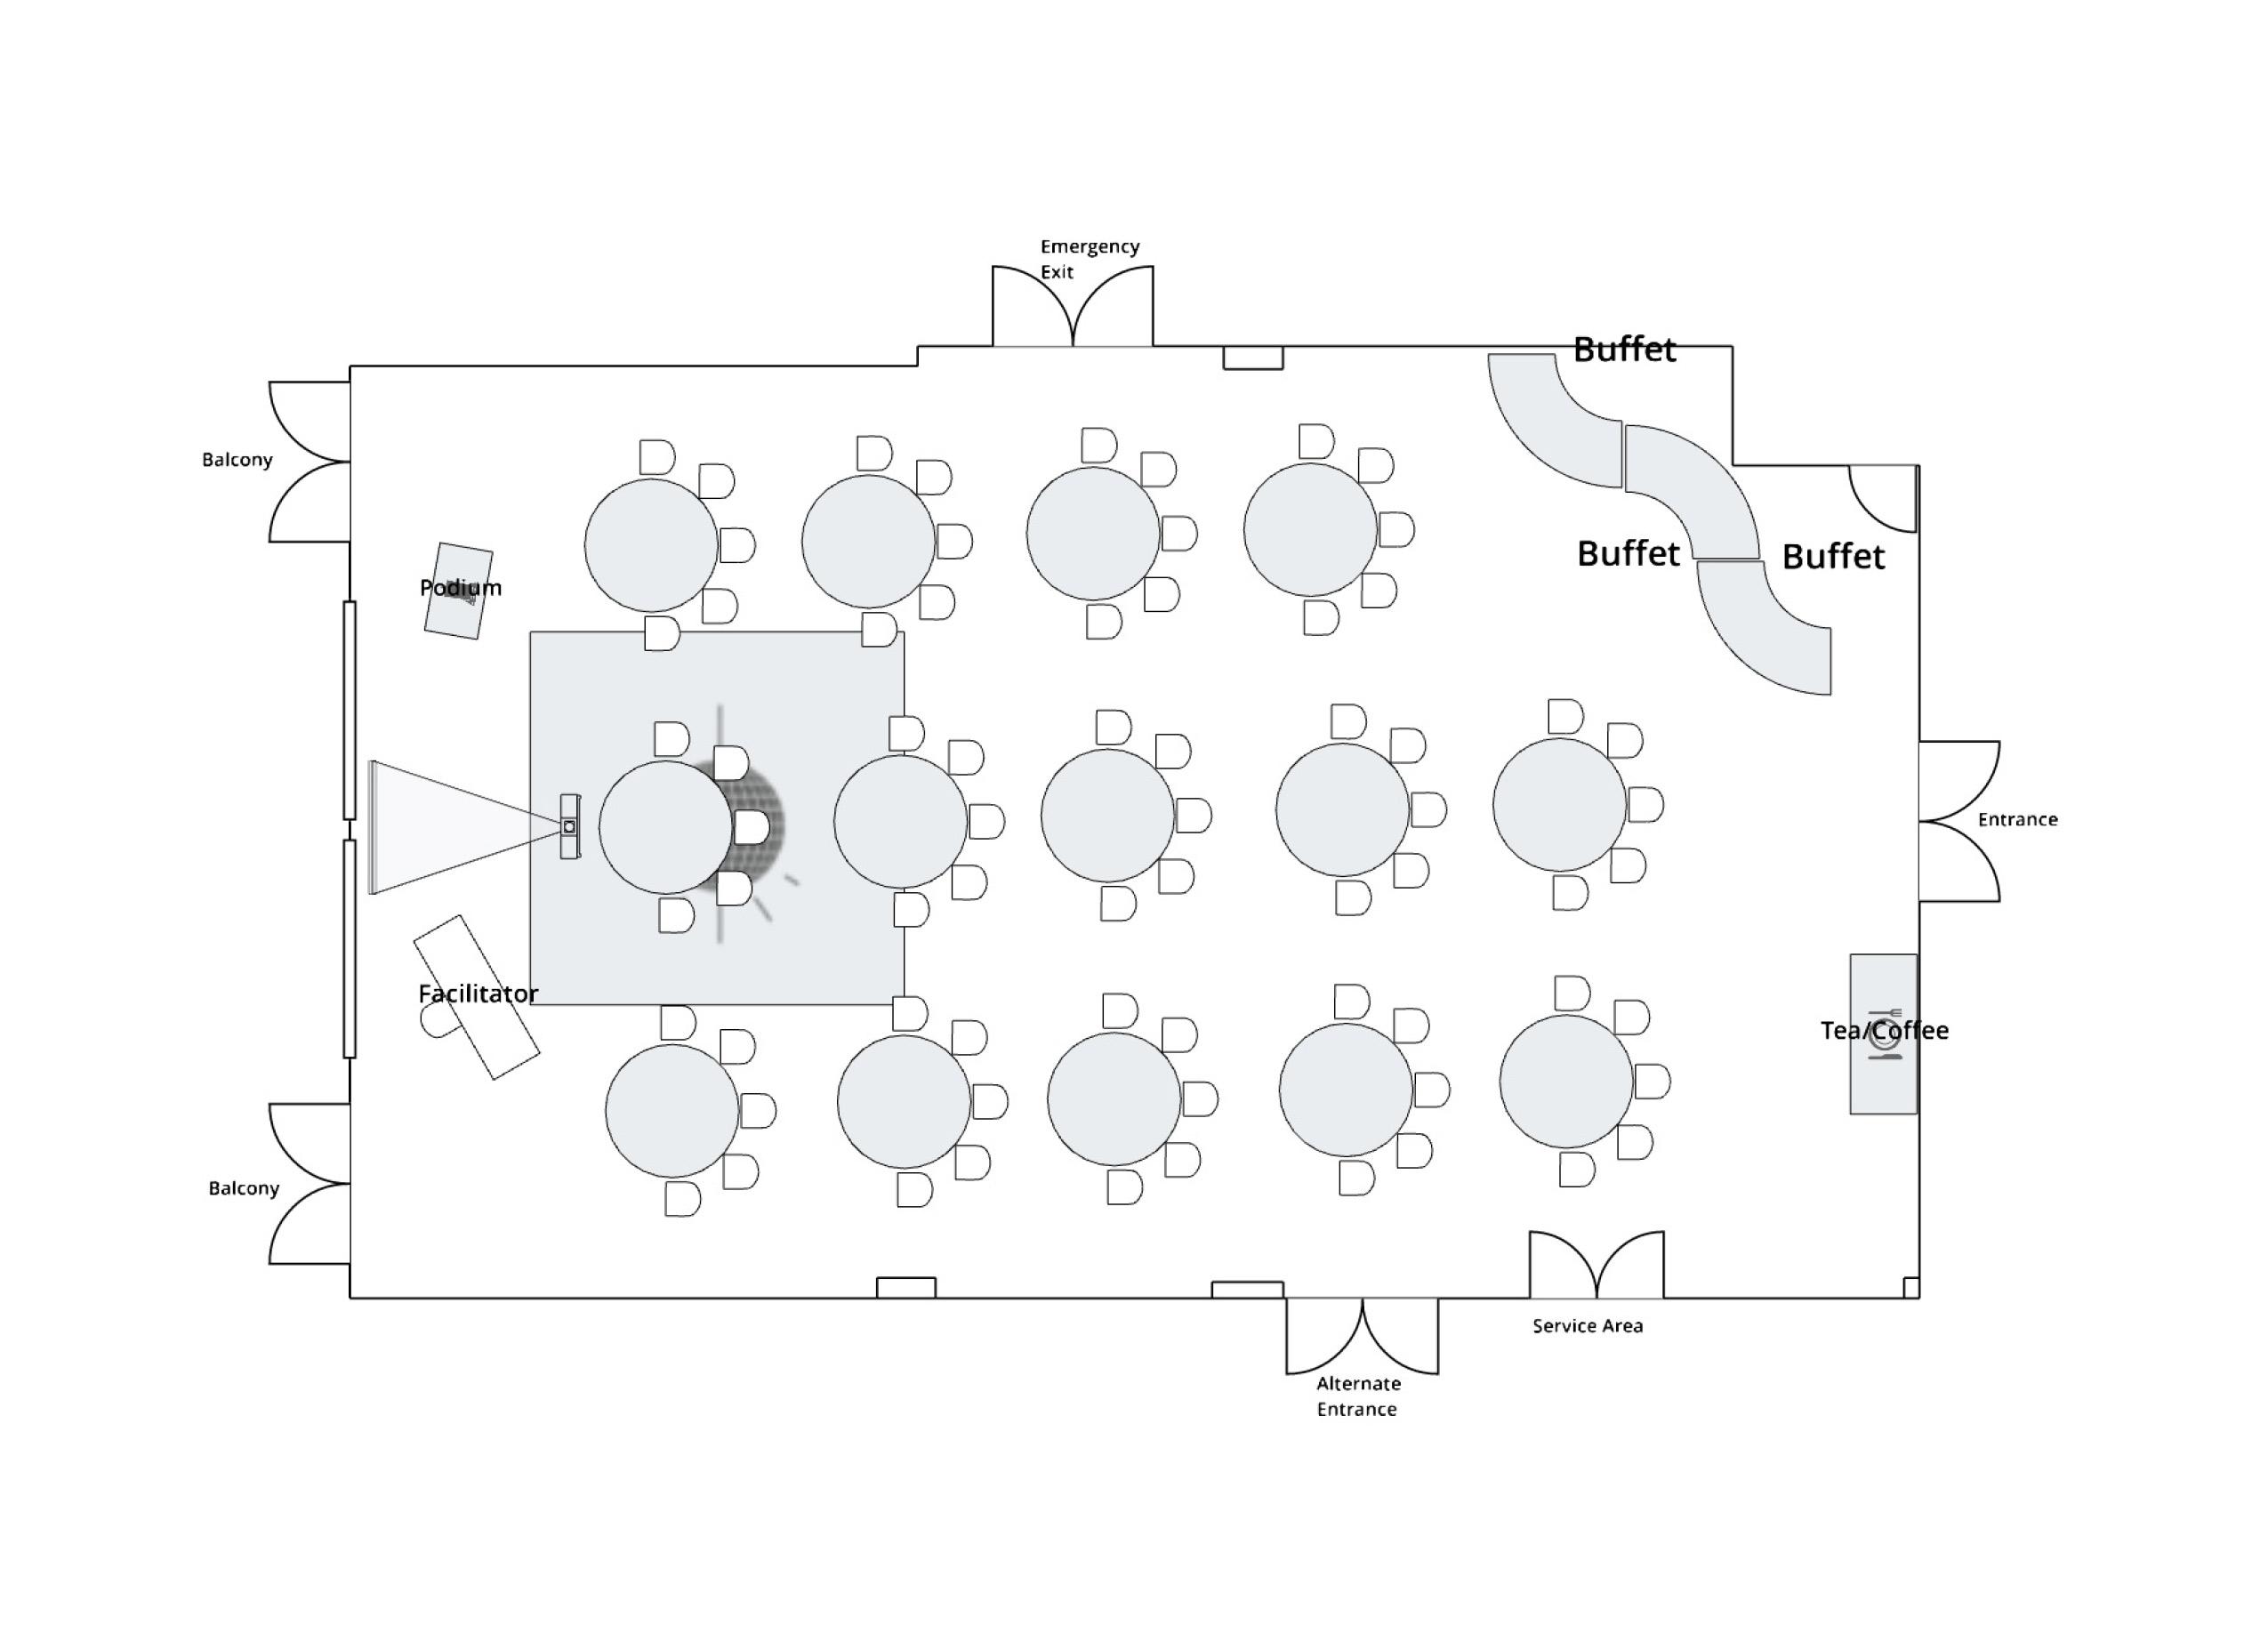 Antler Room Open Rounds of 5 Aligned